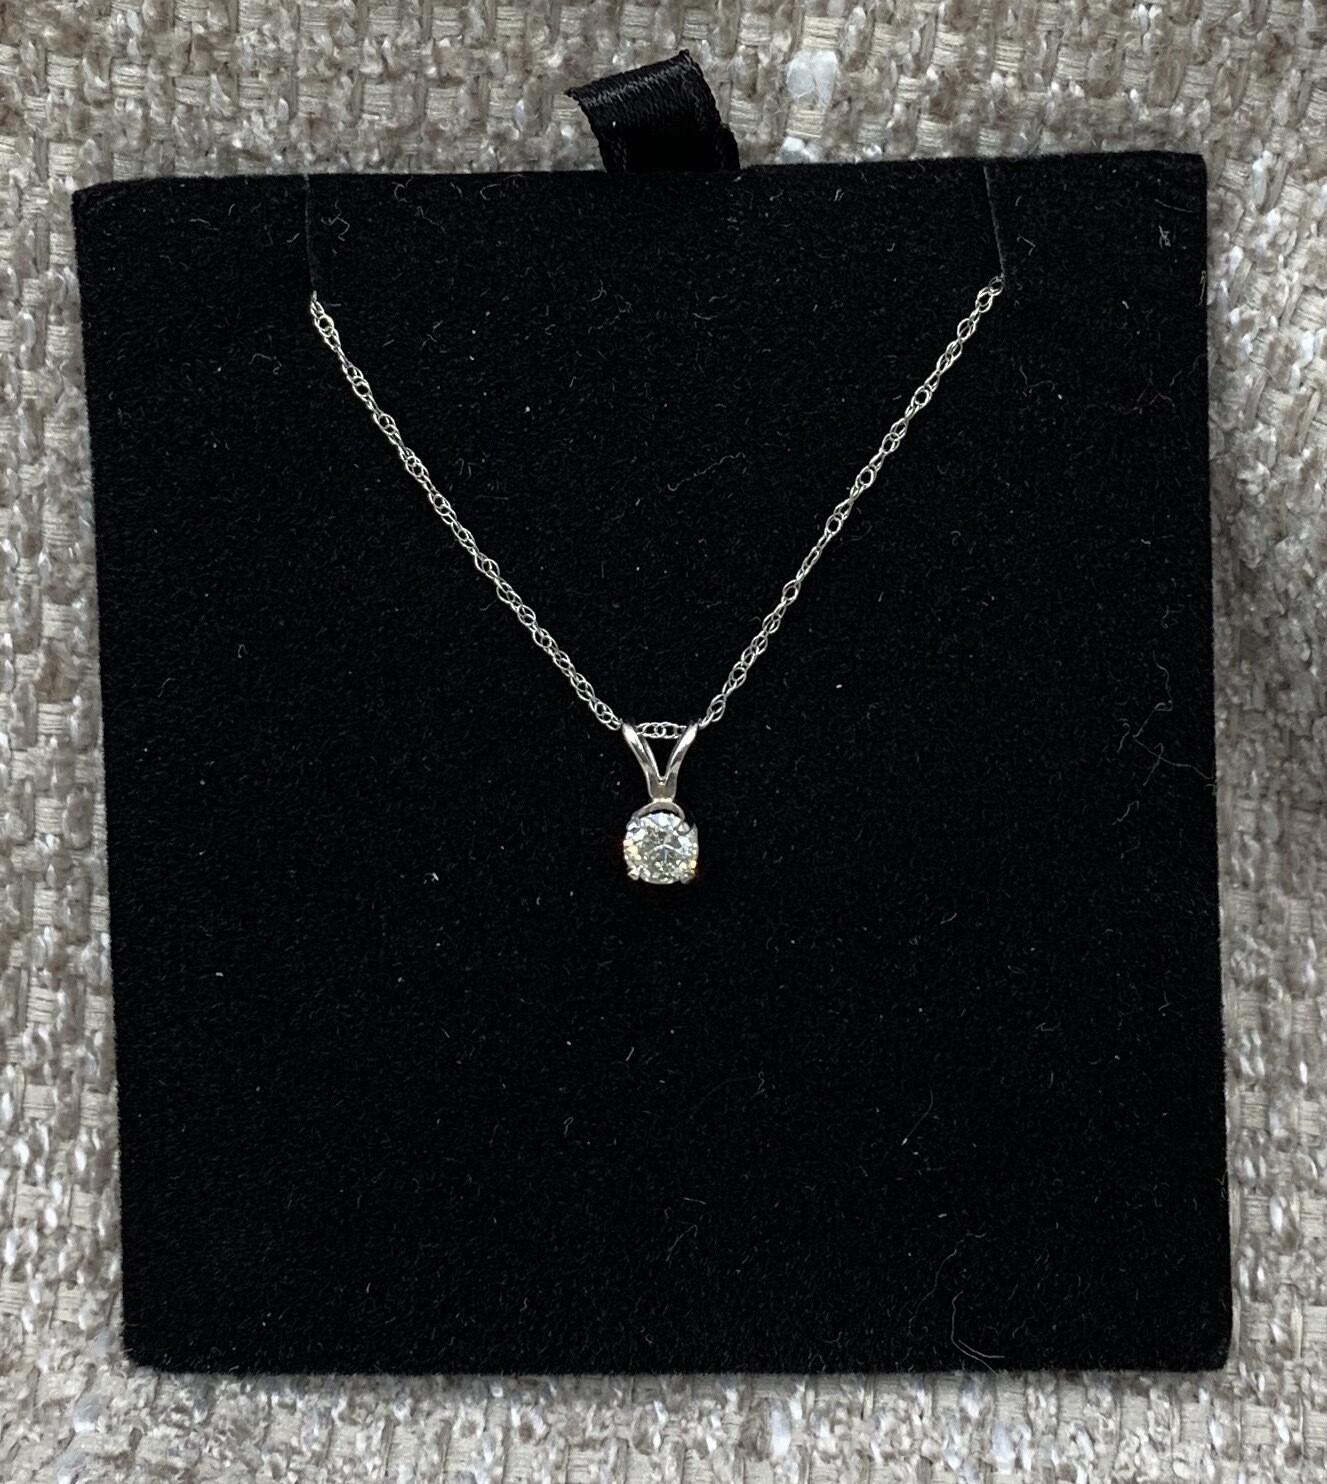 1/4 Ct Diamond Solitaire Necklace